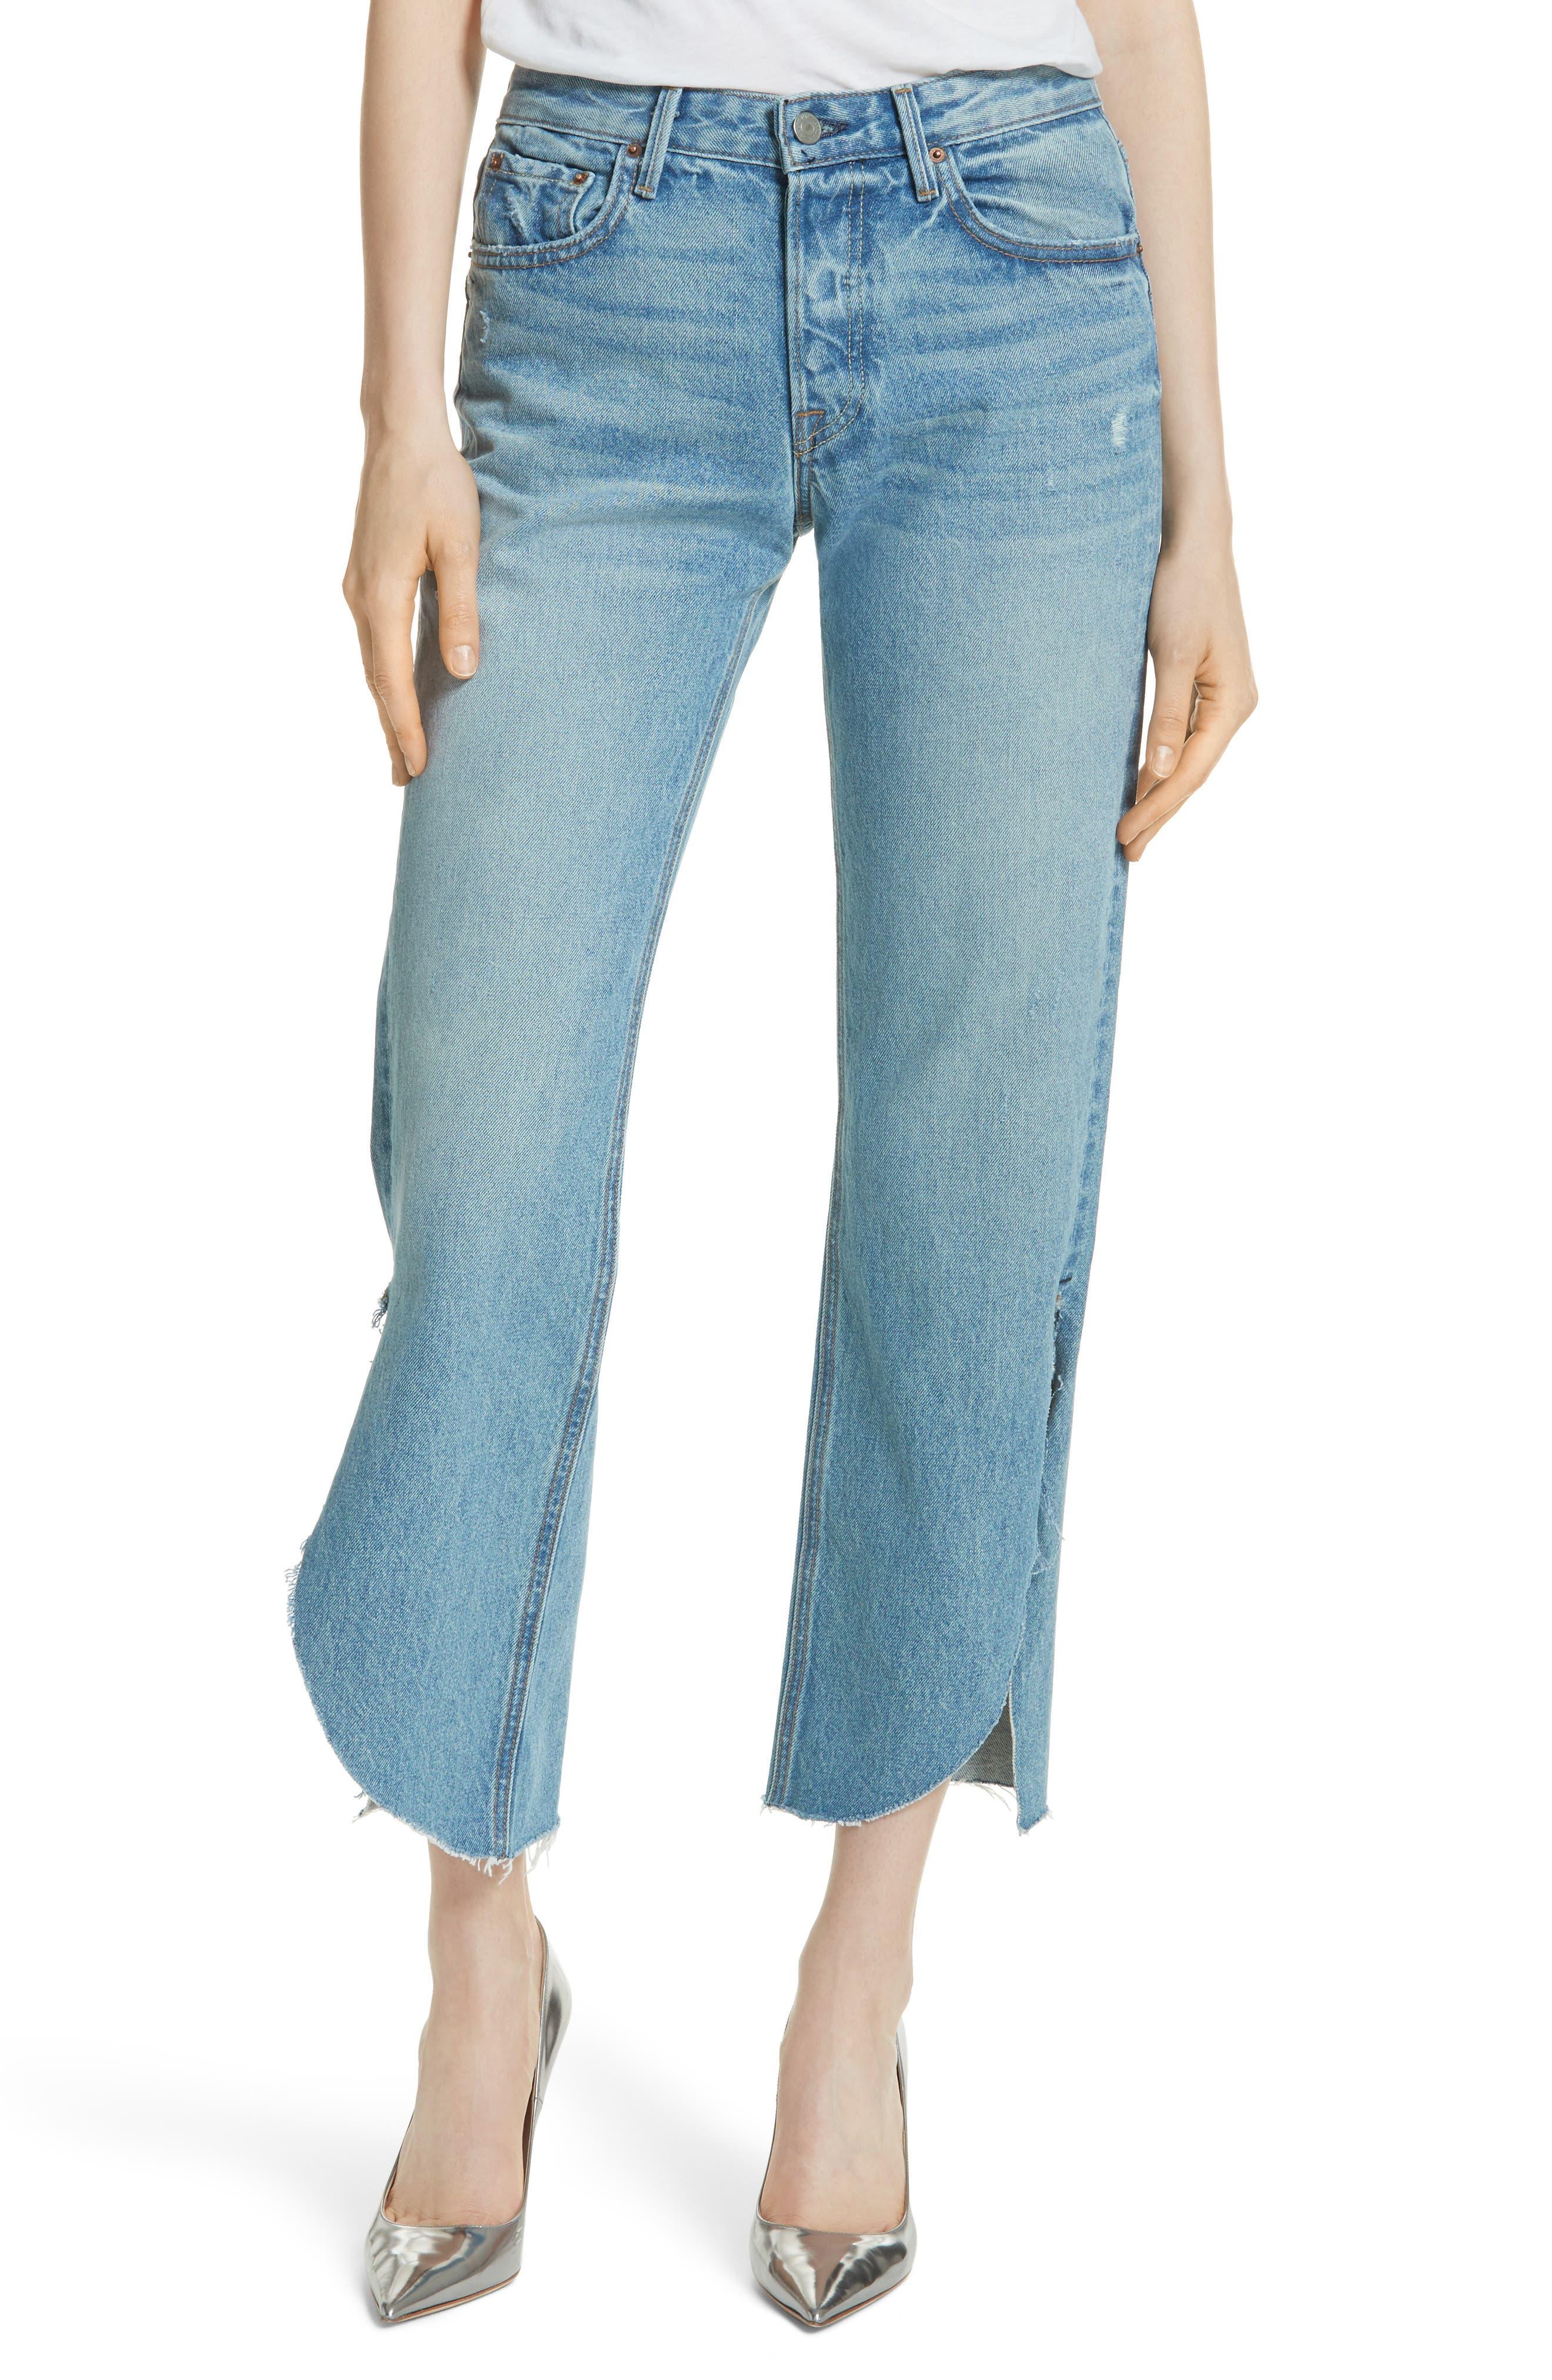 Maran Wide Leg Crop Jeans,                             Main thumbnail 1, color,                             483